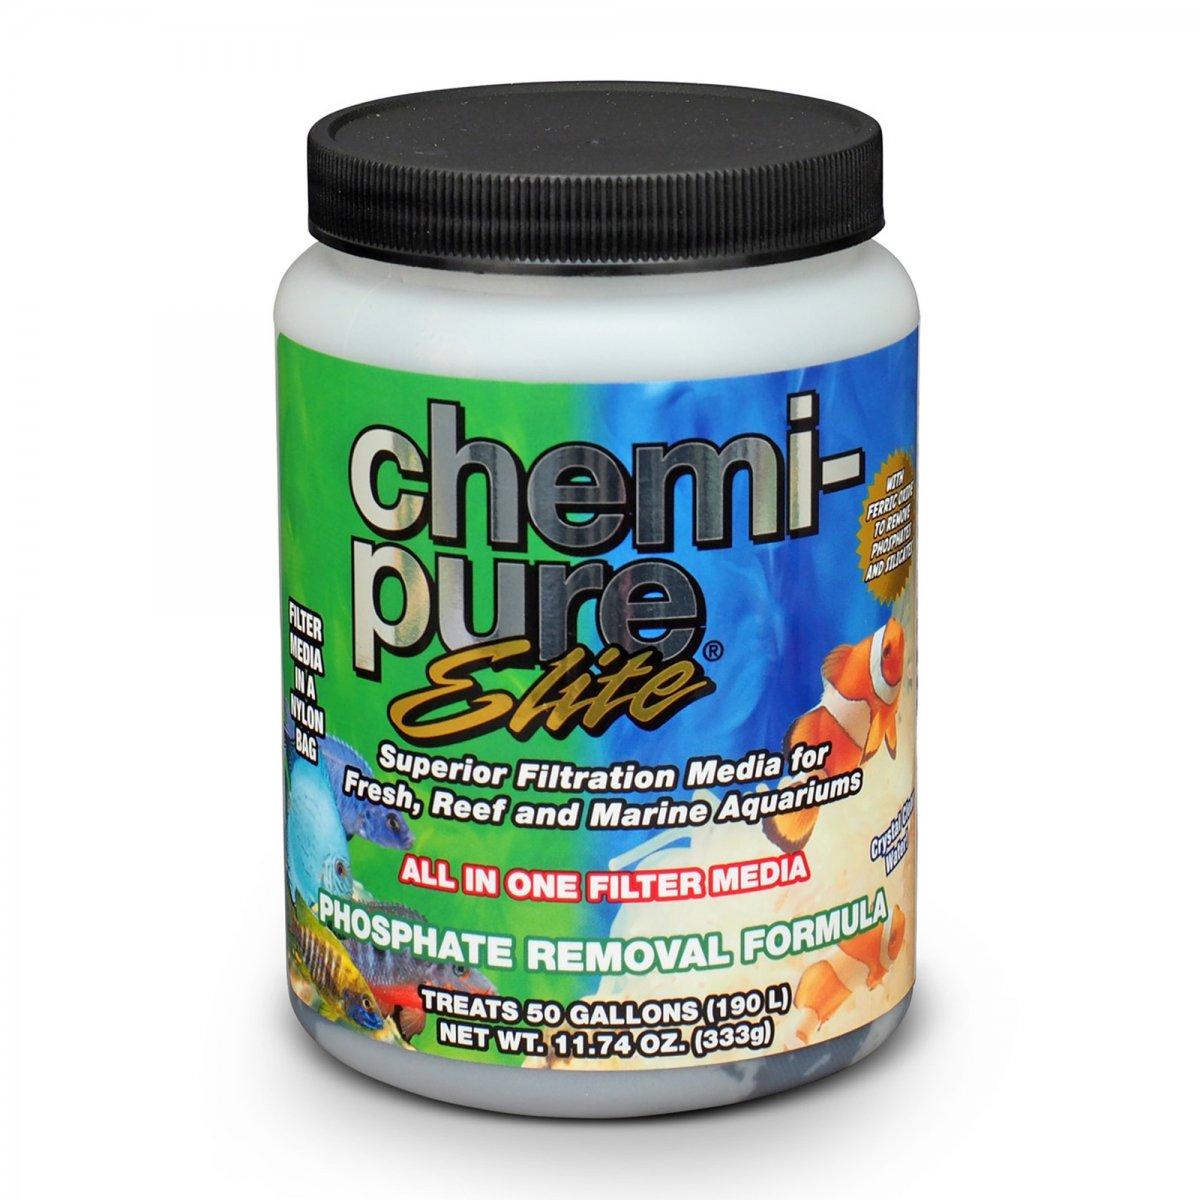 Chemi-pure Elite 11.74 oz.jpg